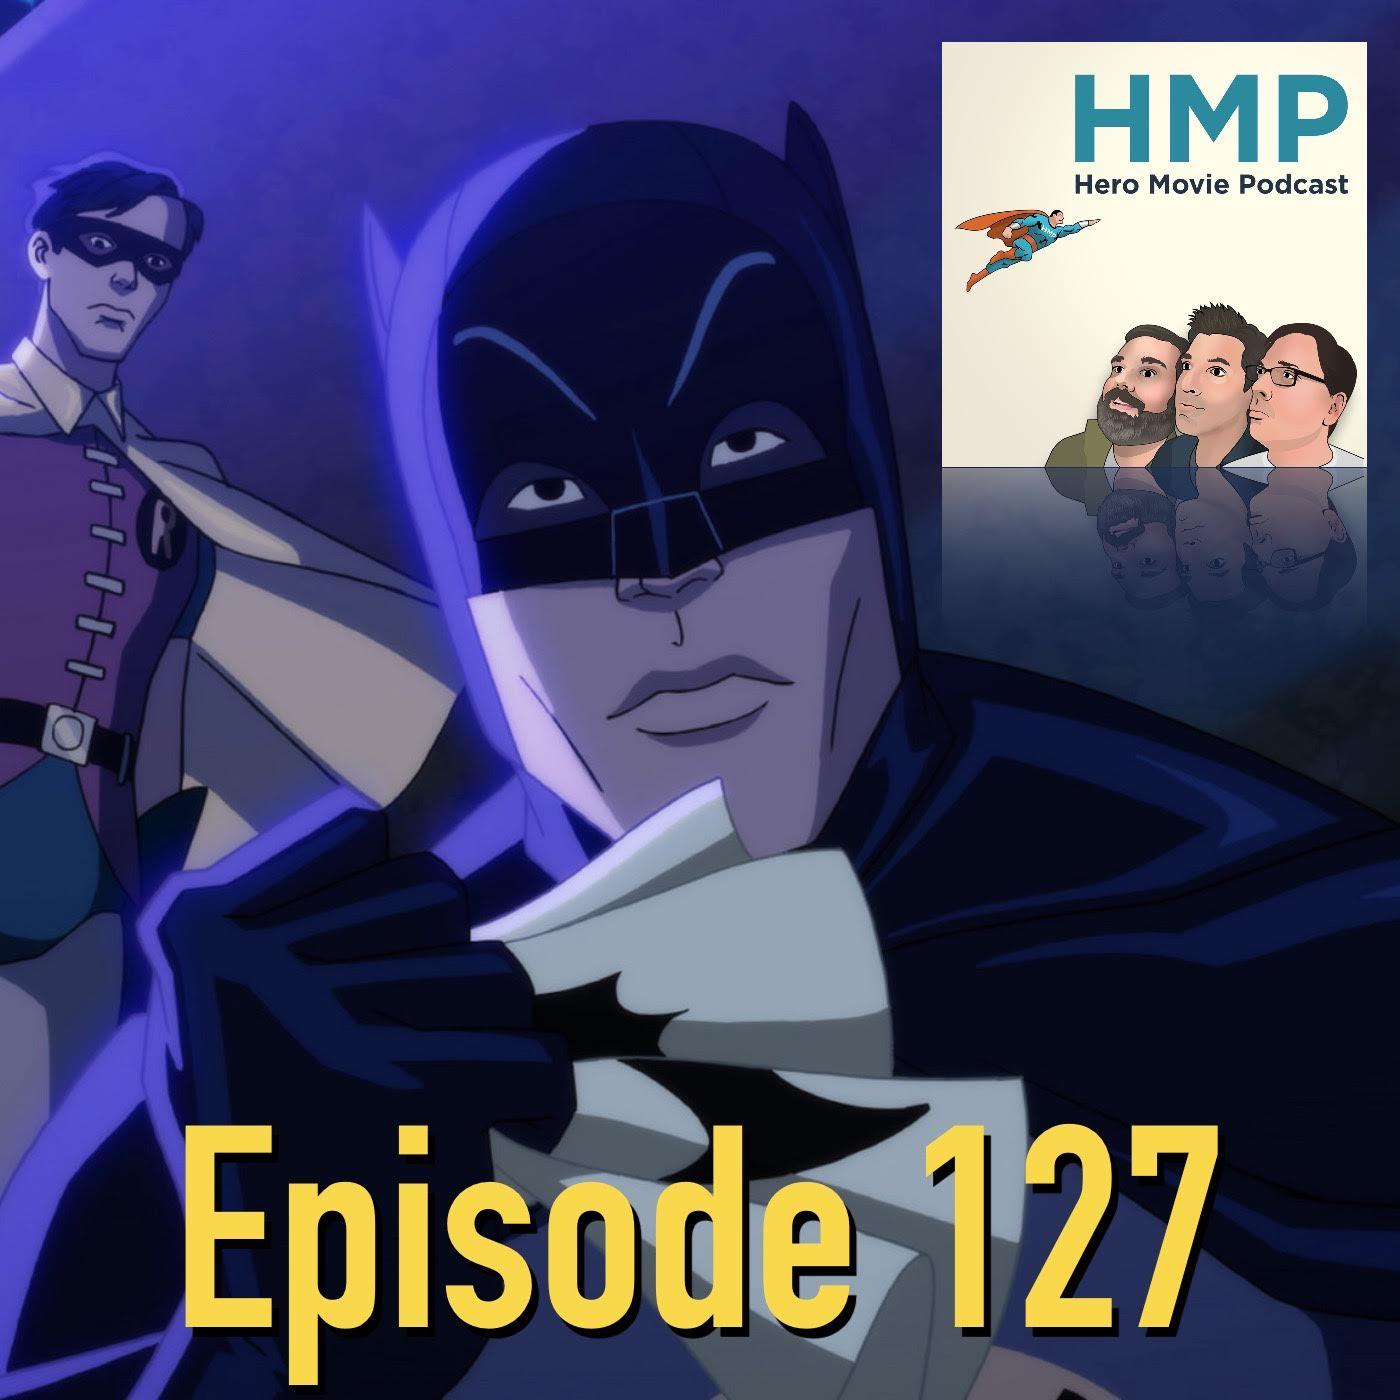 Episode 127- Batman: Return of the Caped Crusaders